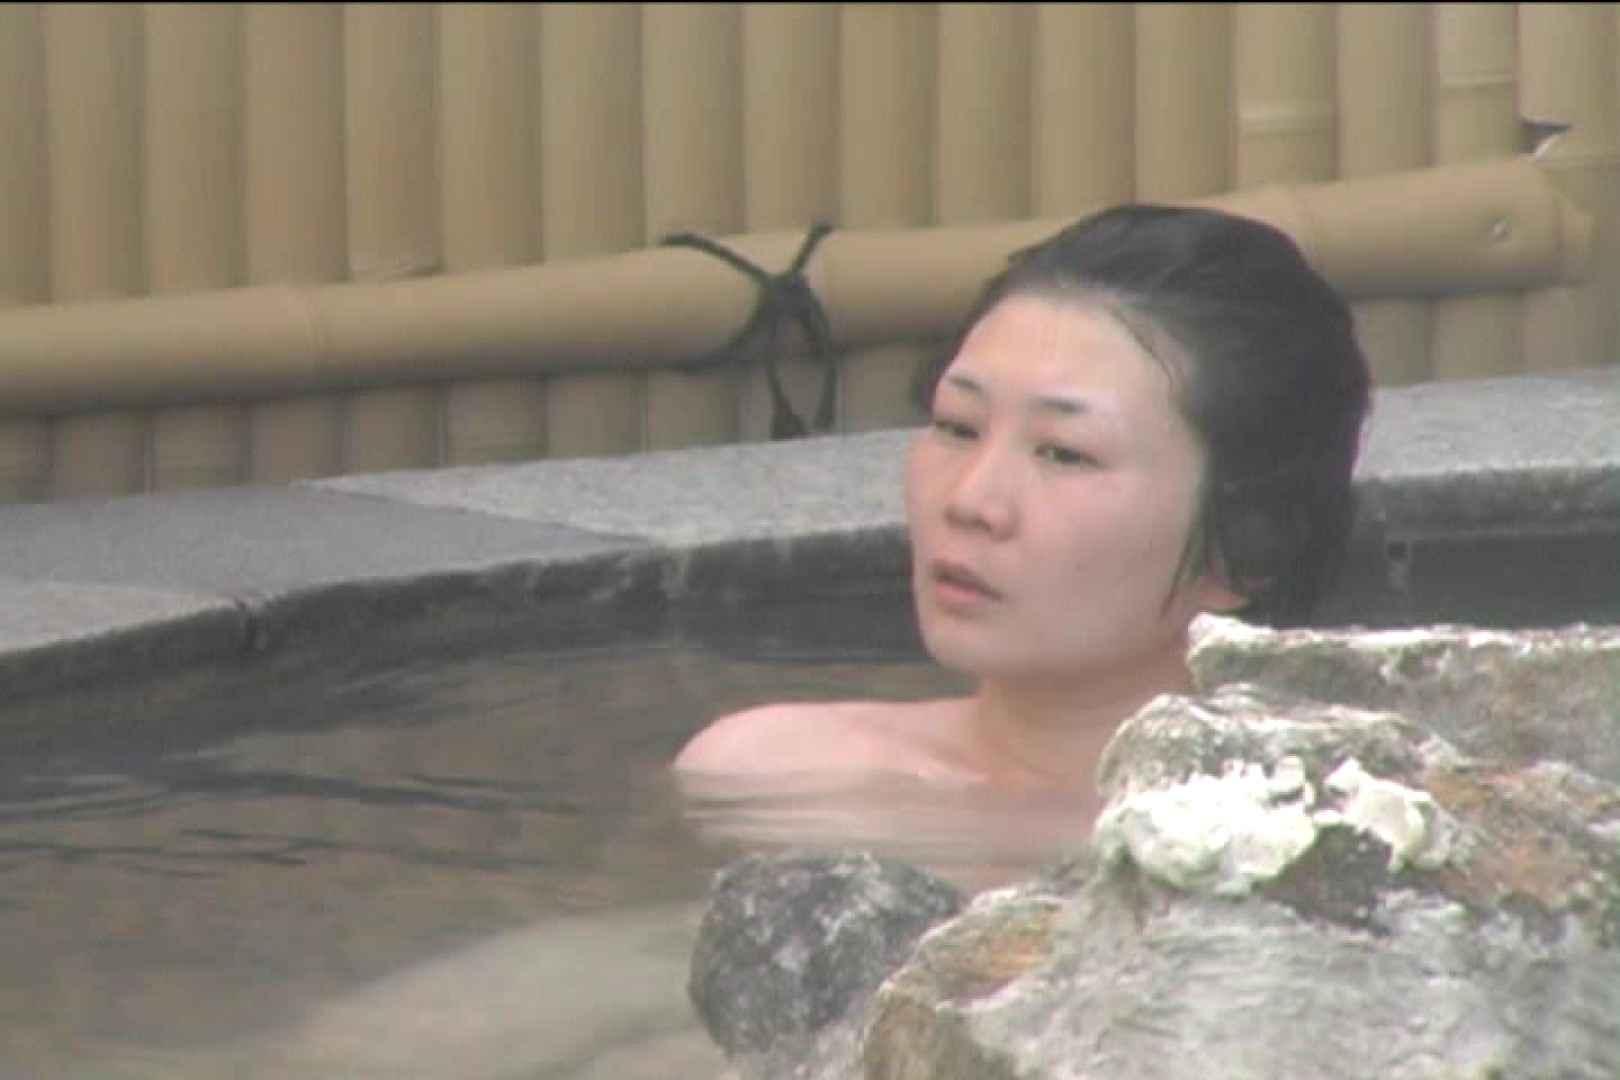 Aquaな露天風呂Vol.531 盗撮大放出 戯れ無修正画像 90連発 58